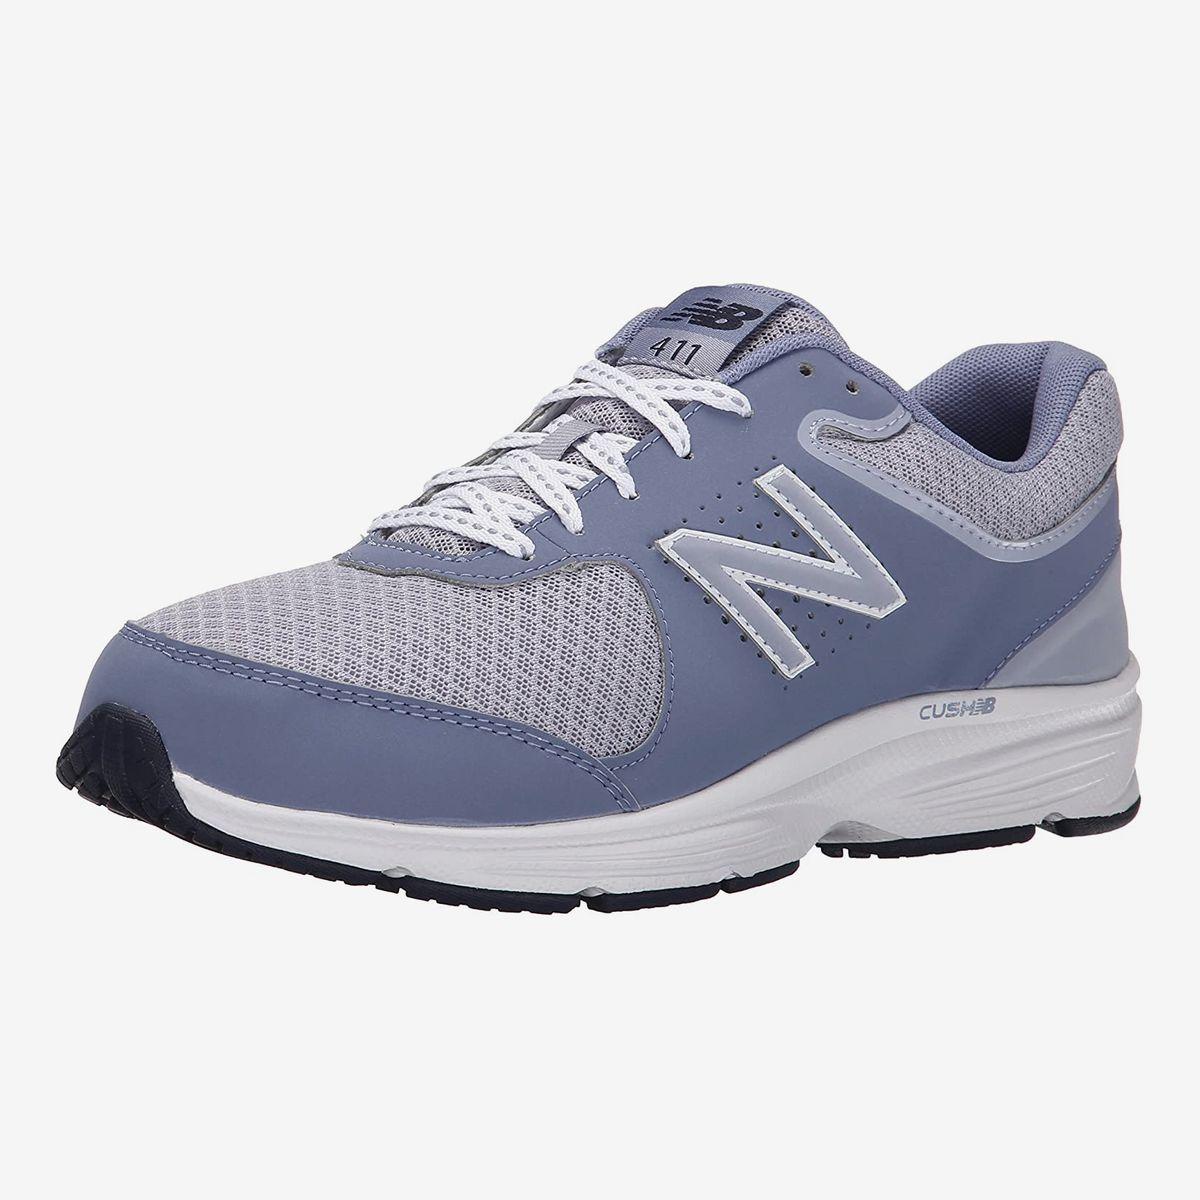 comfortable walking sneakers